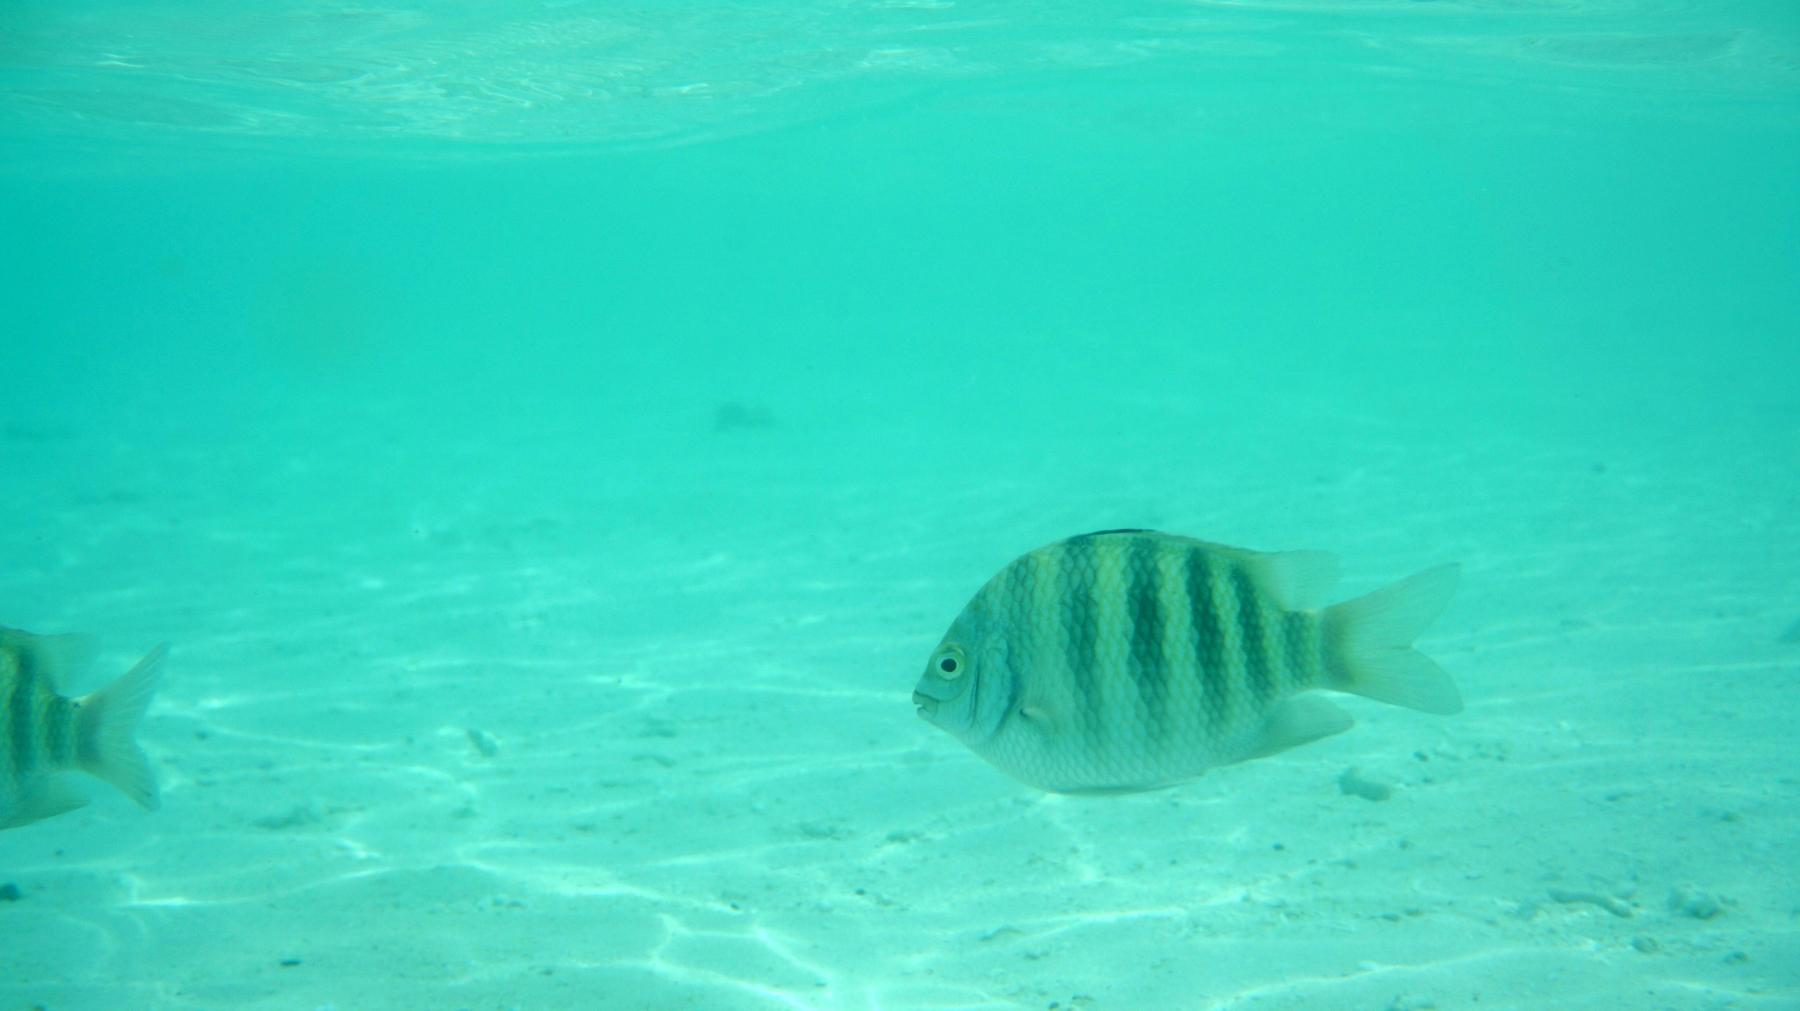 Abudefduf_vaigiensis_007_C_Damiselas-Peces-Payaso_L_Maldivas_U_Sebas_04072015